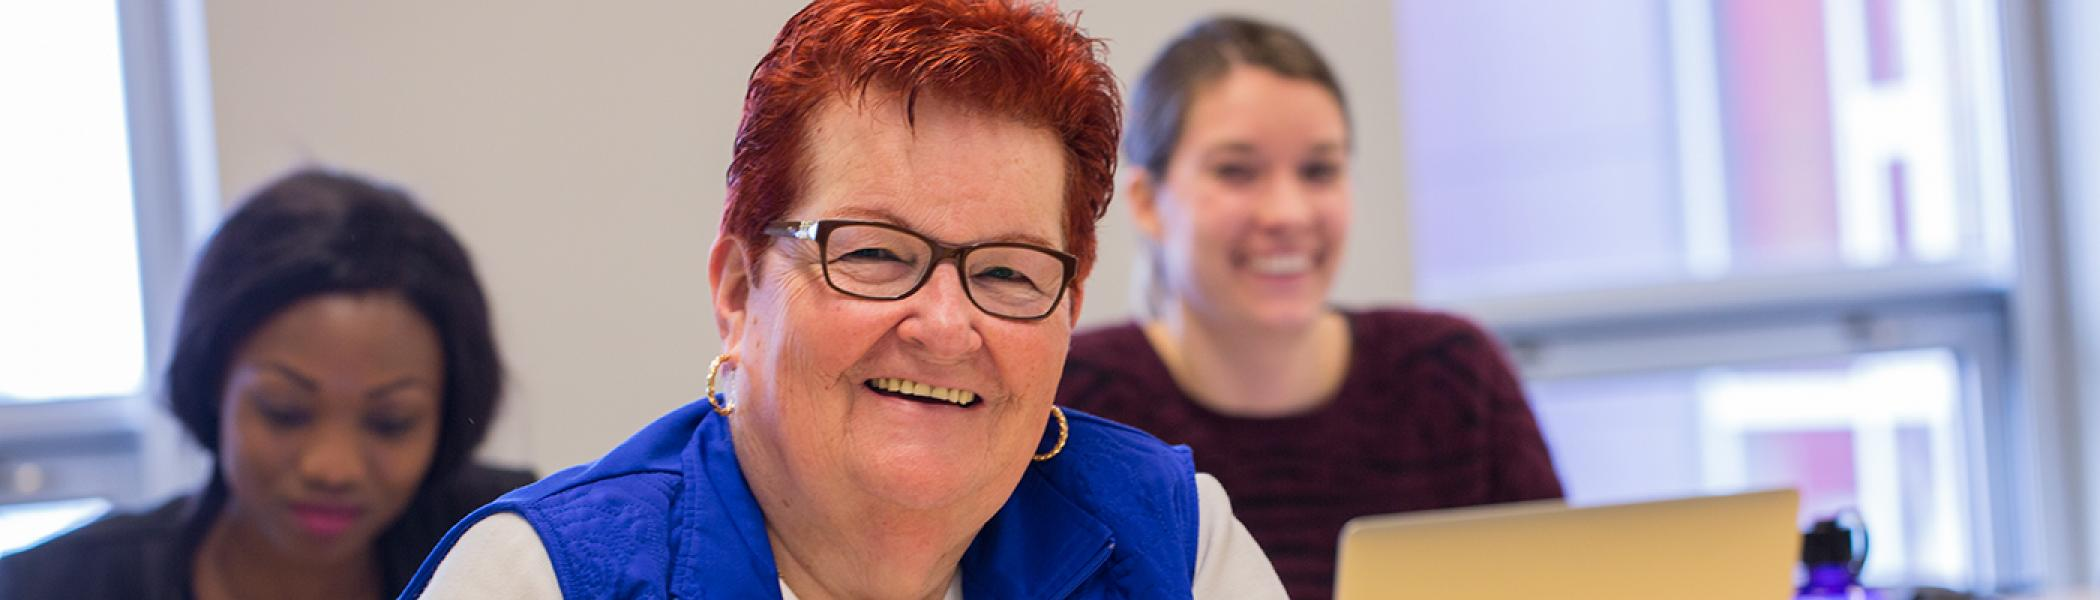 Sex grannies mature women